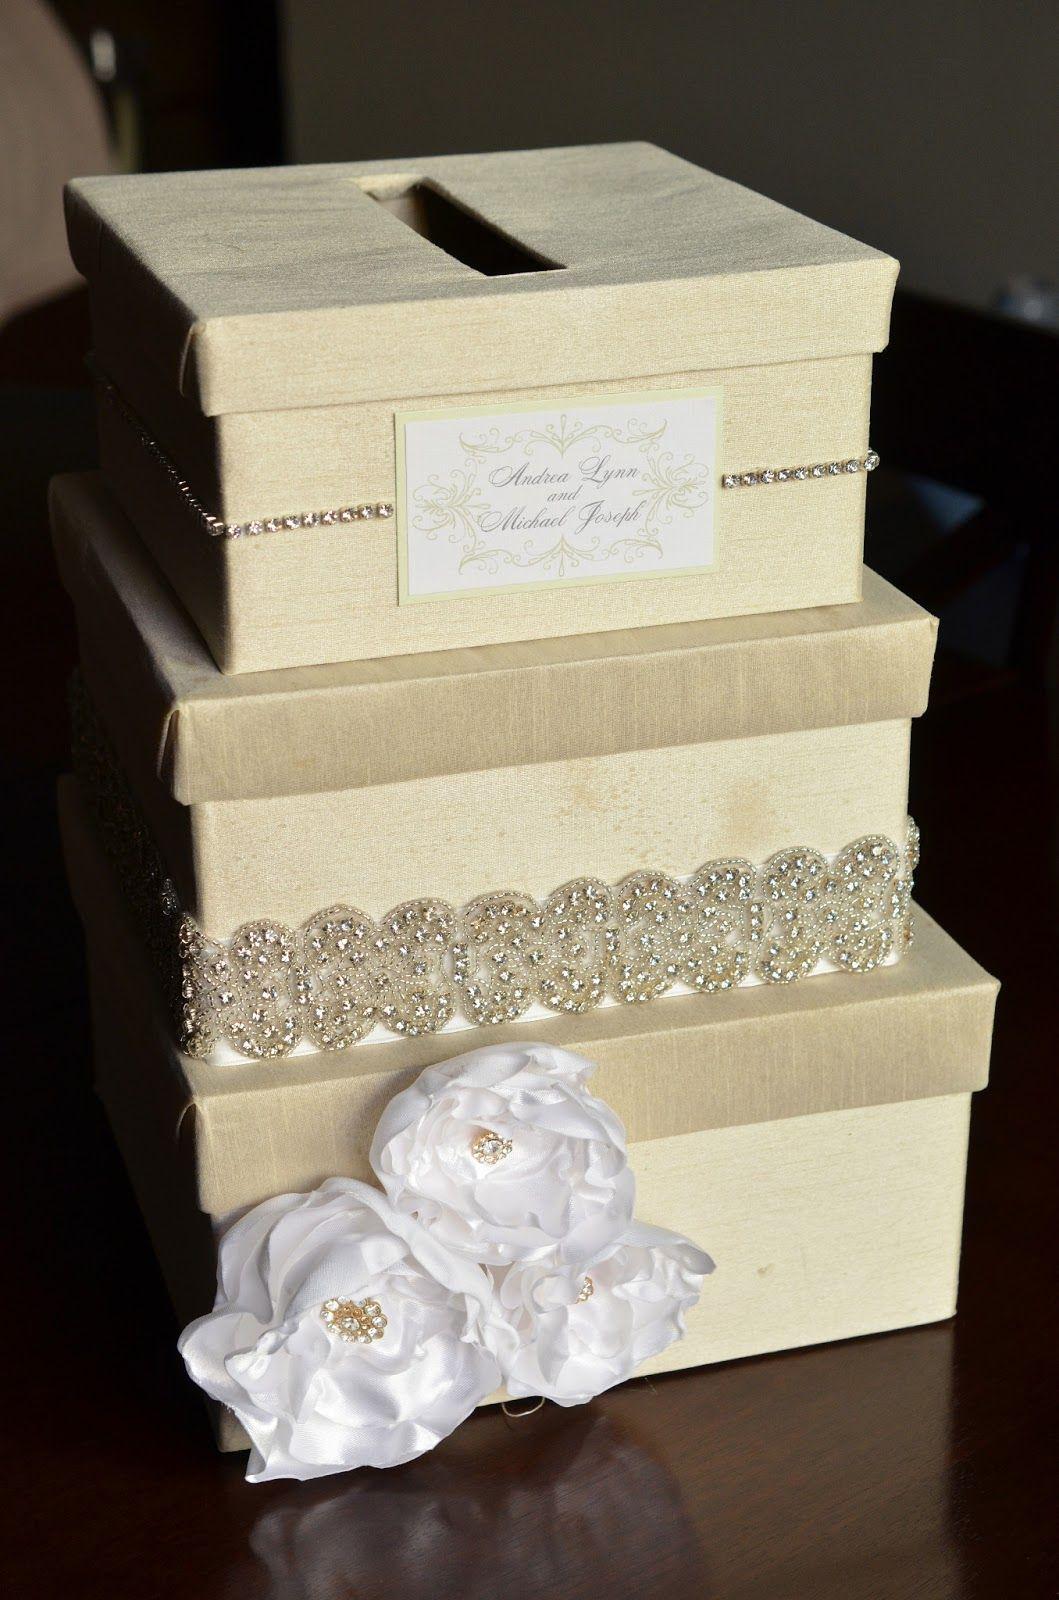 Andrea Lynn Handmade Diy Wedding Card Box Tutorial With Diffe Colors And Ts